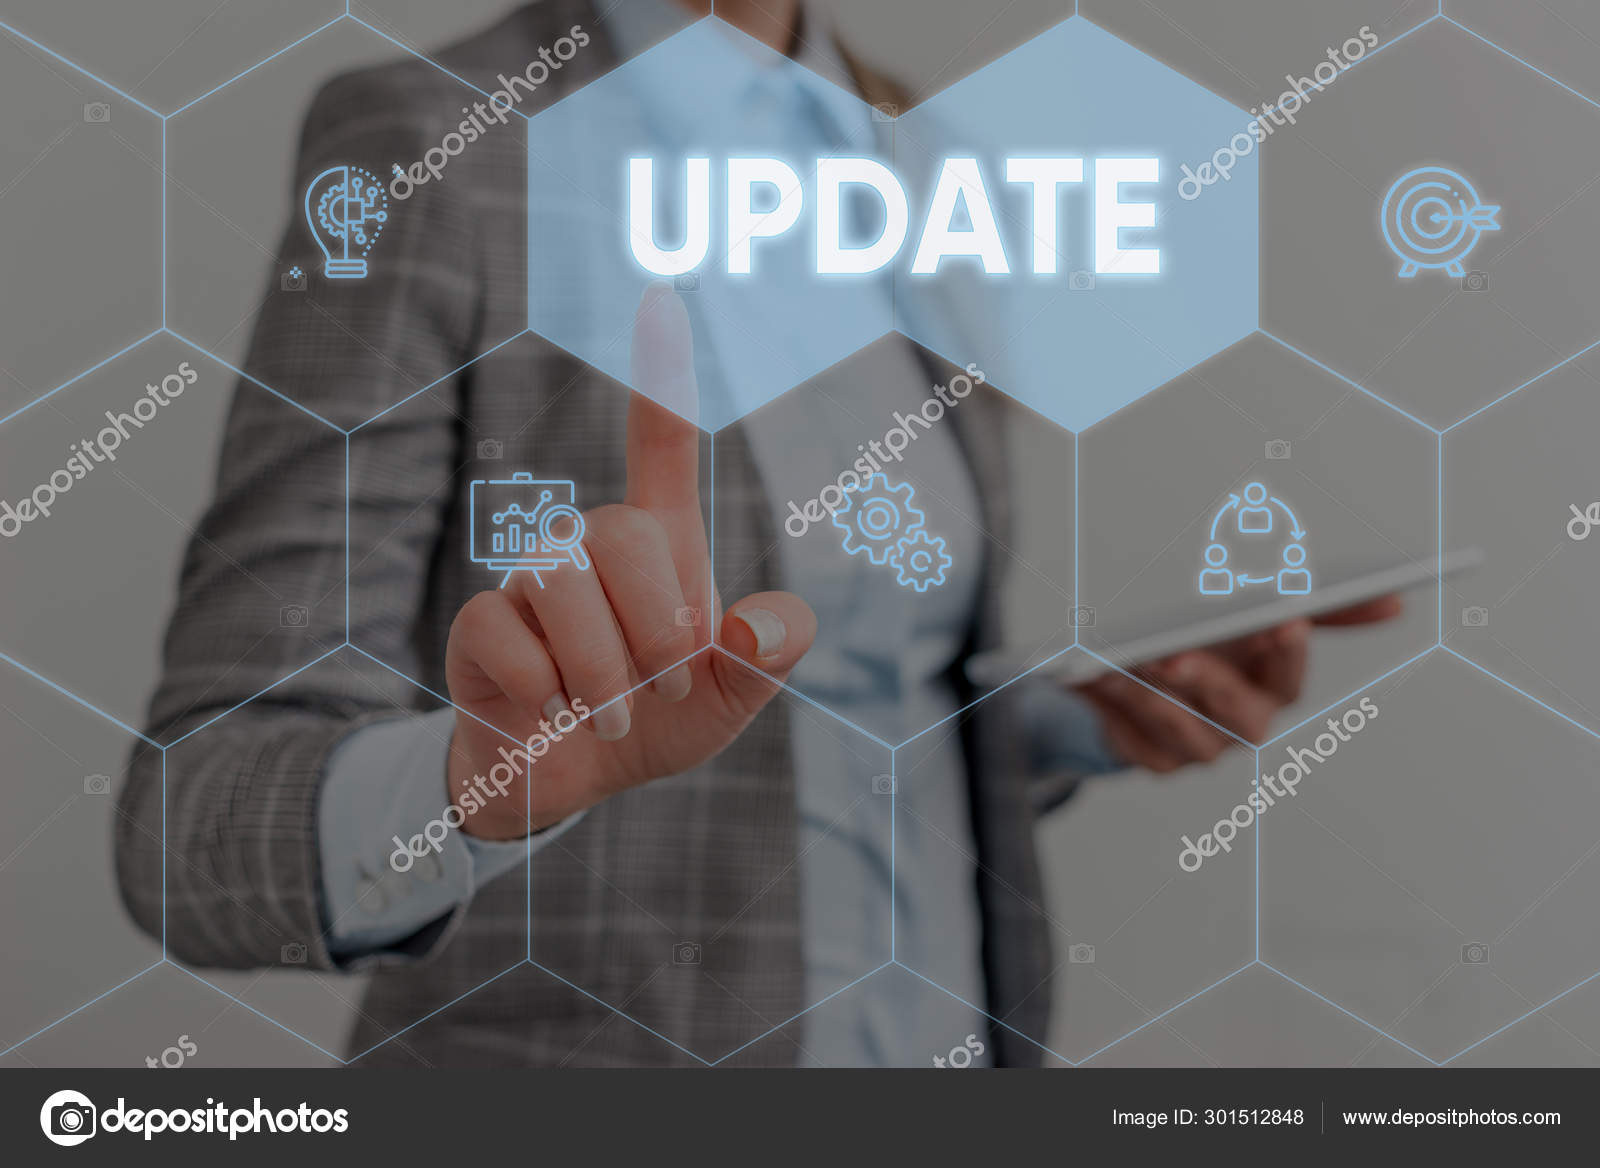 https tr depositphotos com 301512848 stock photo conceptual hand writing showing update html